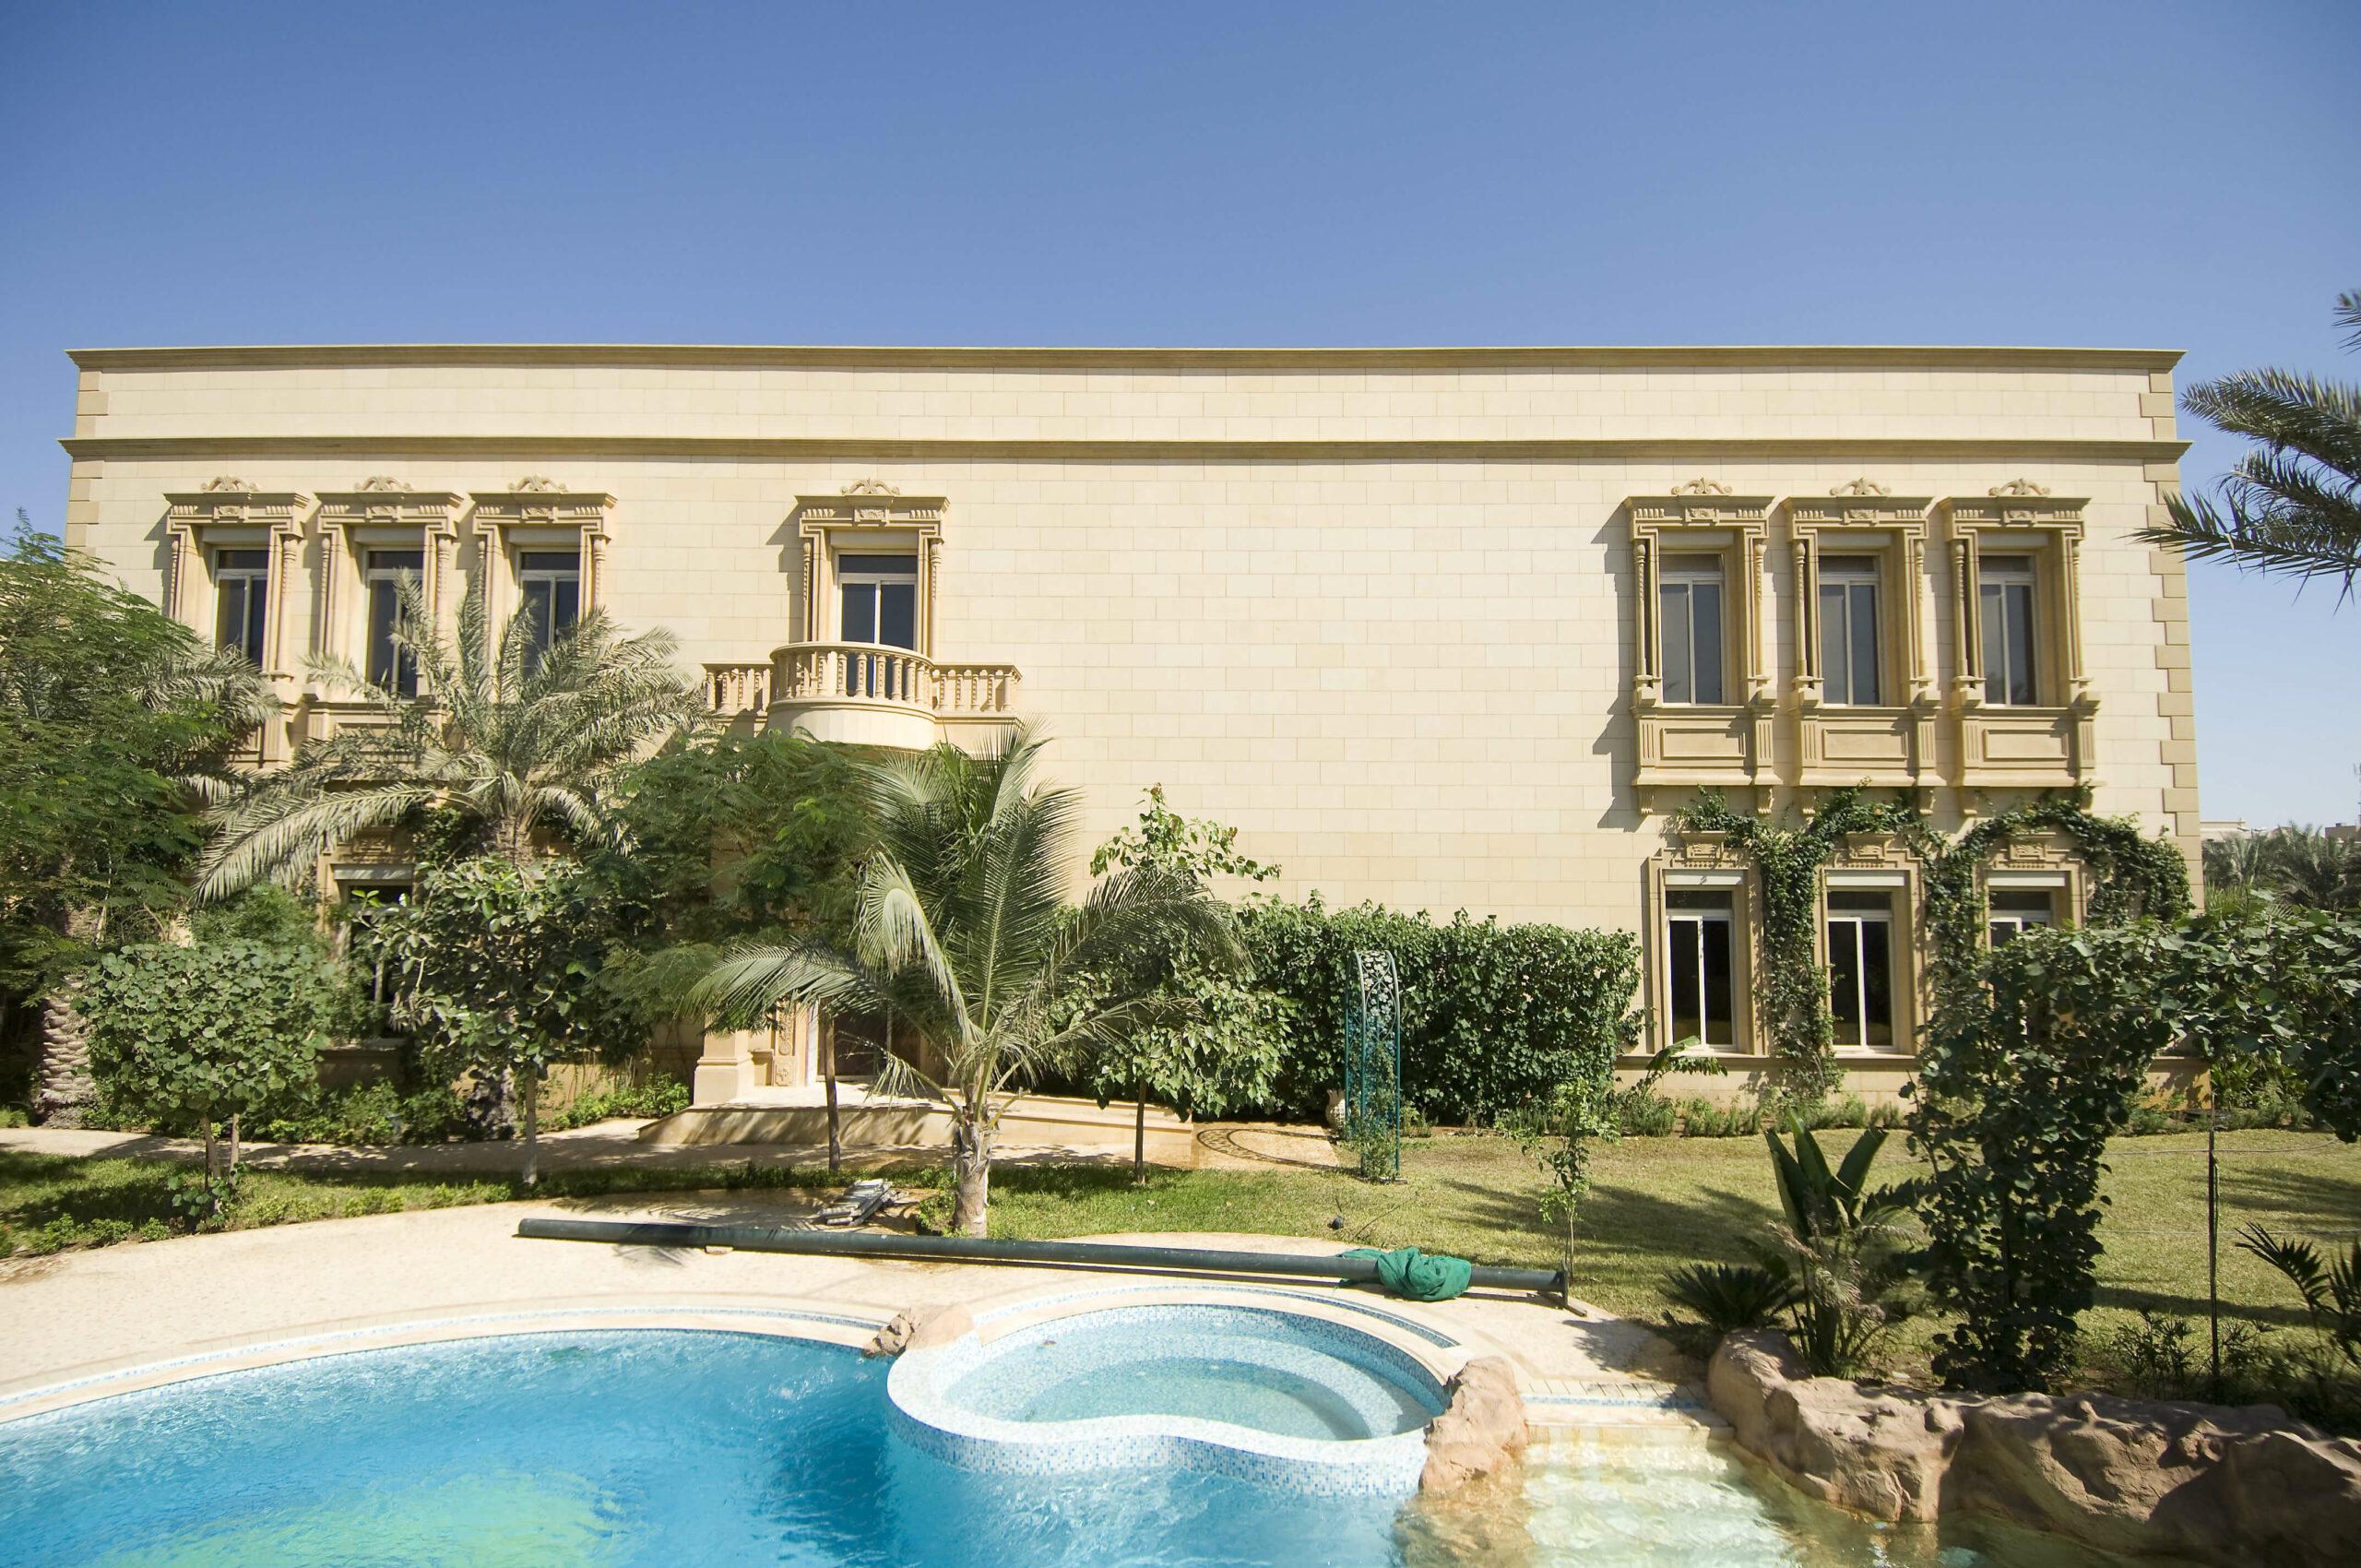 Dr. Talal Ghazzawi Residence – Jeddah